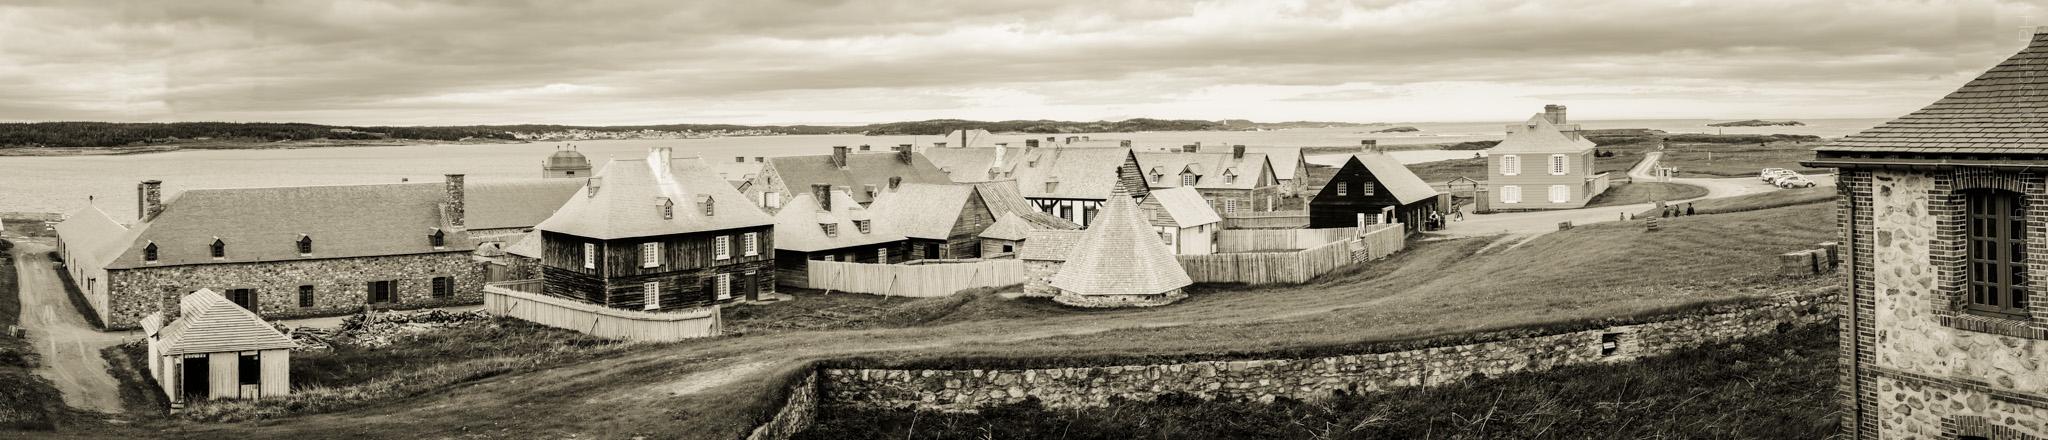 Louisbourg Panoramic